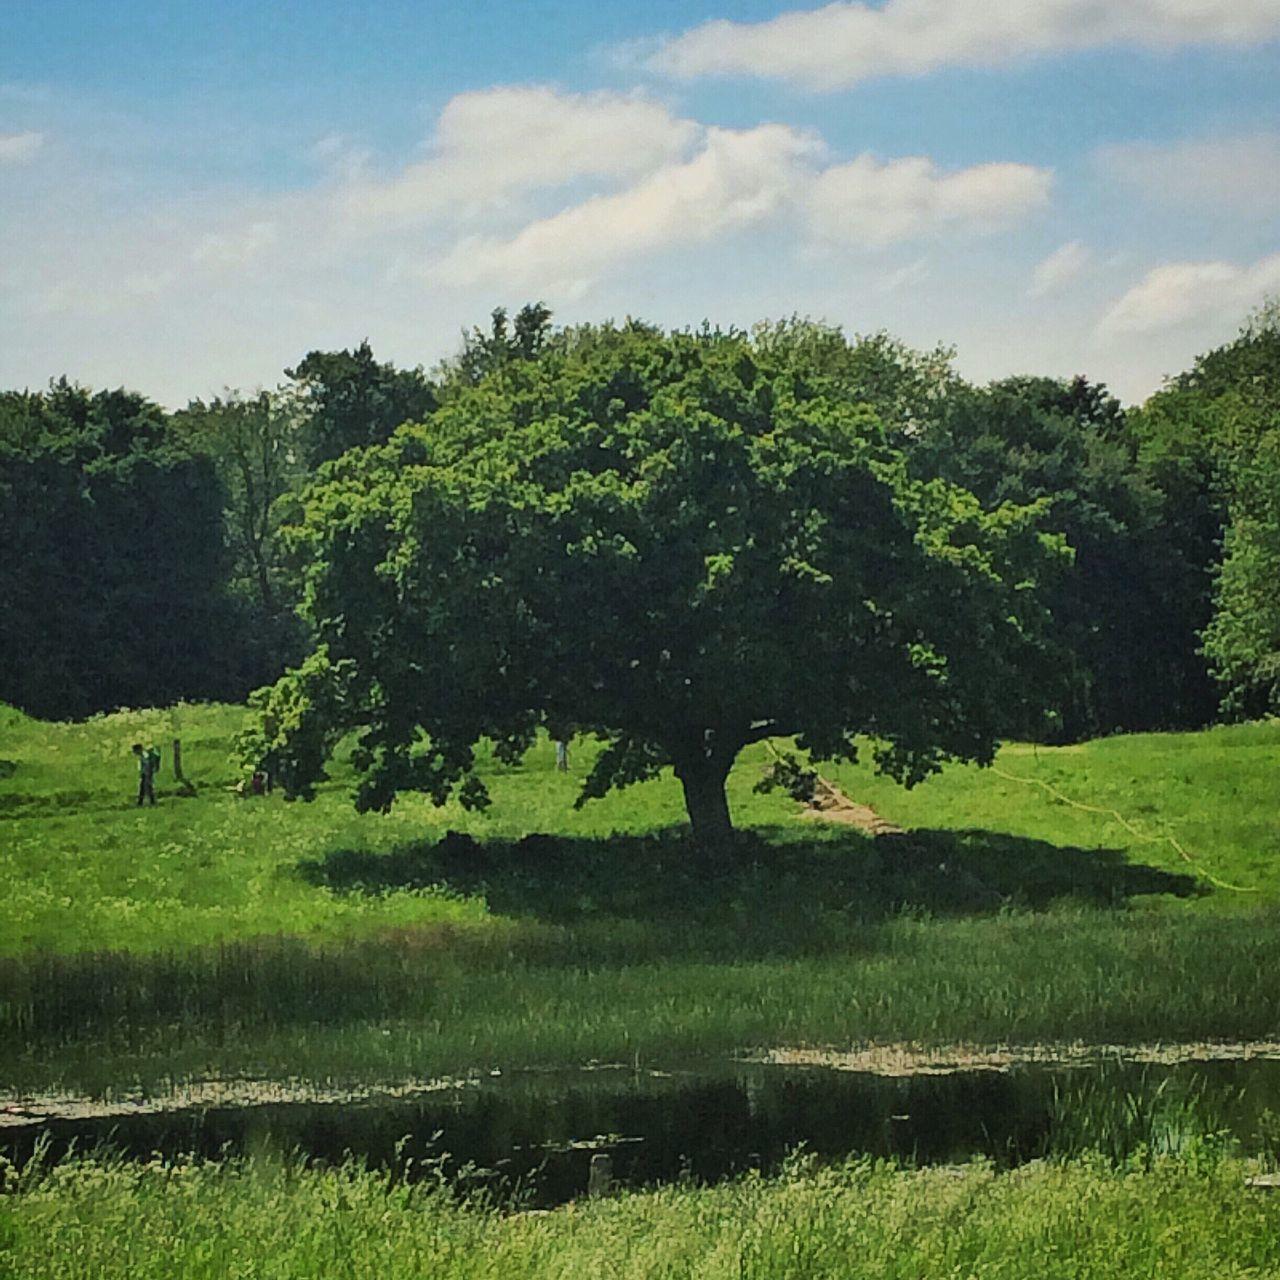 Summer In Denmark Denmark Lejre Trees TreePorn Tree_collection  Sky And Trees Himmel Skyer Exploring New Ground